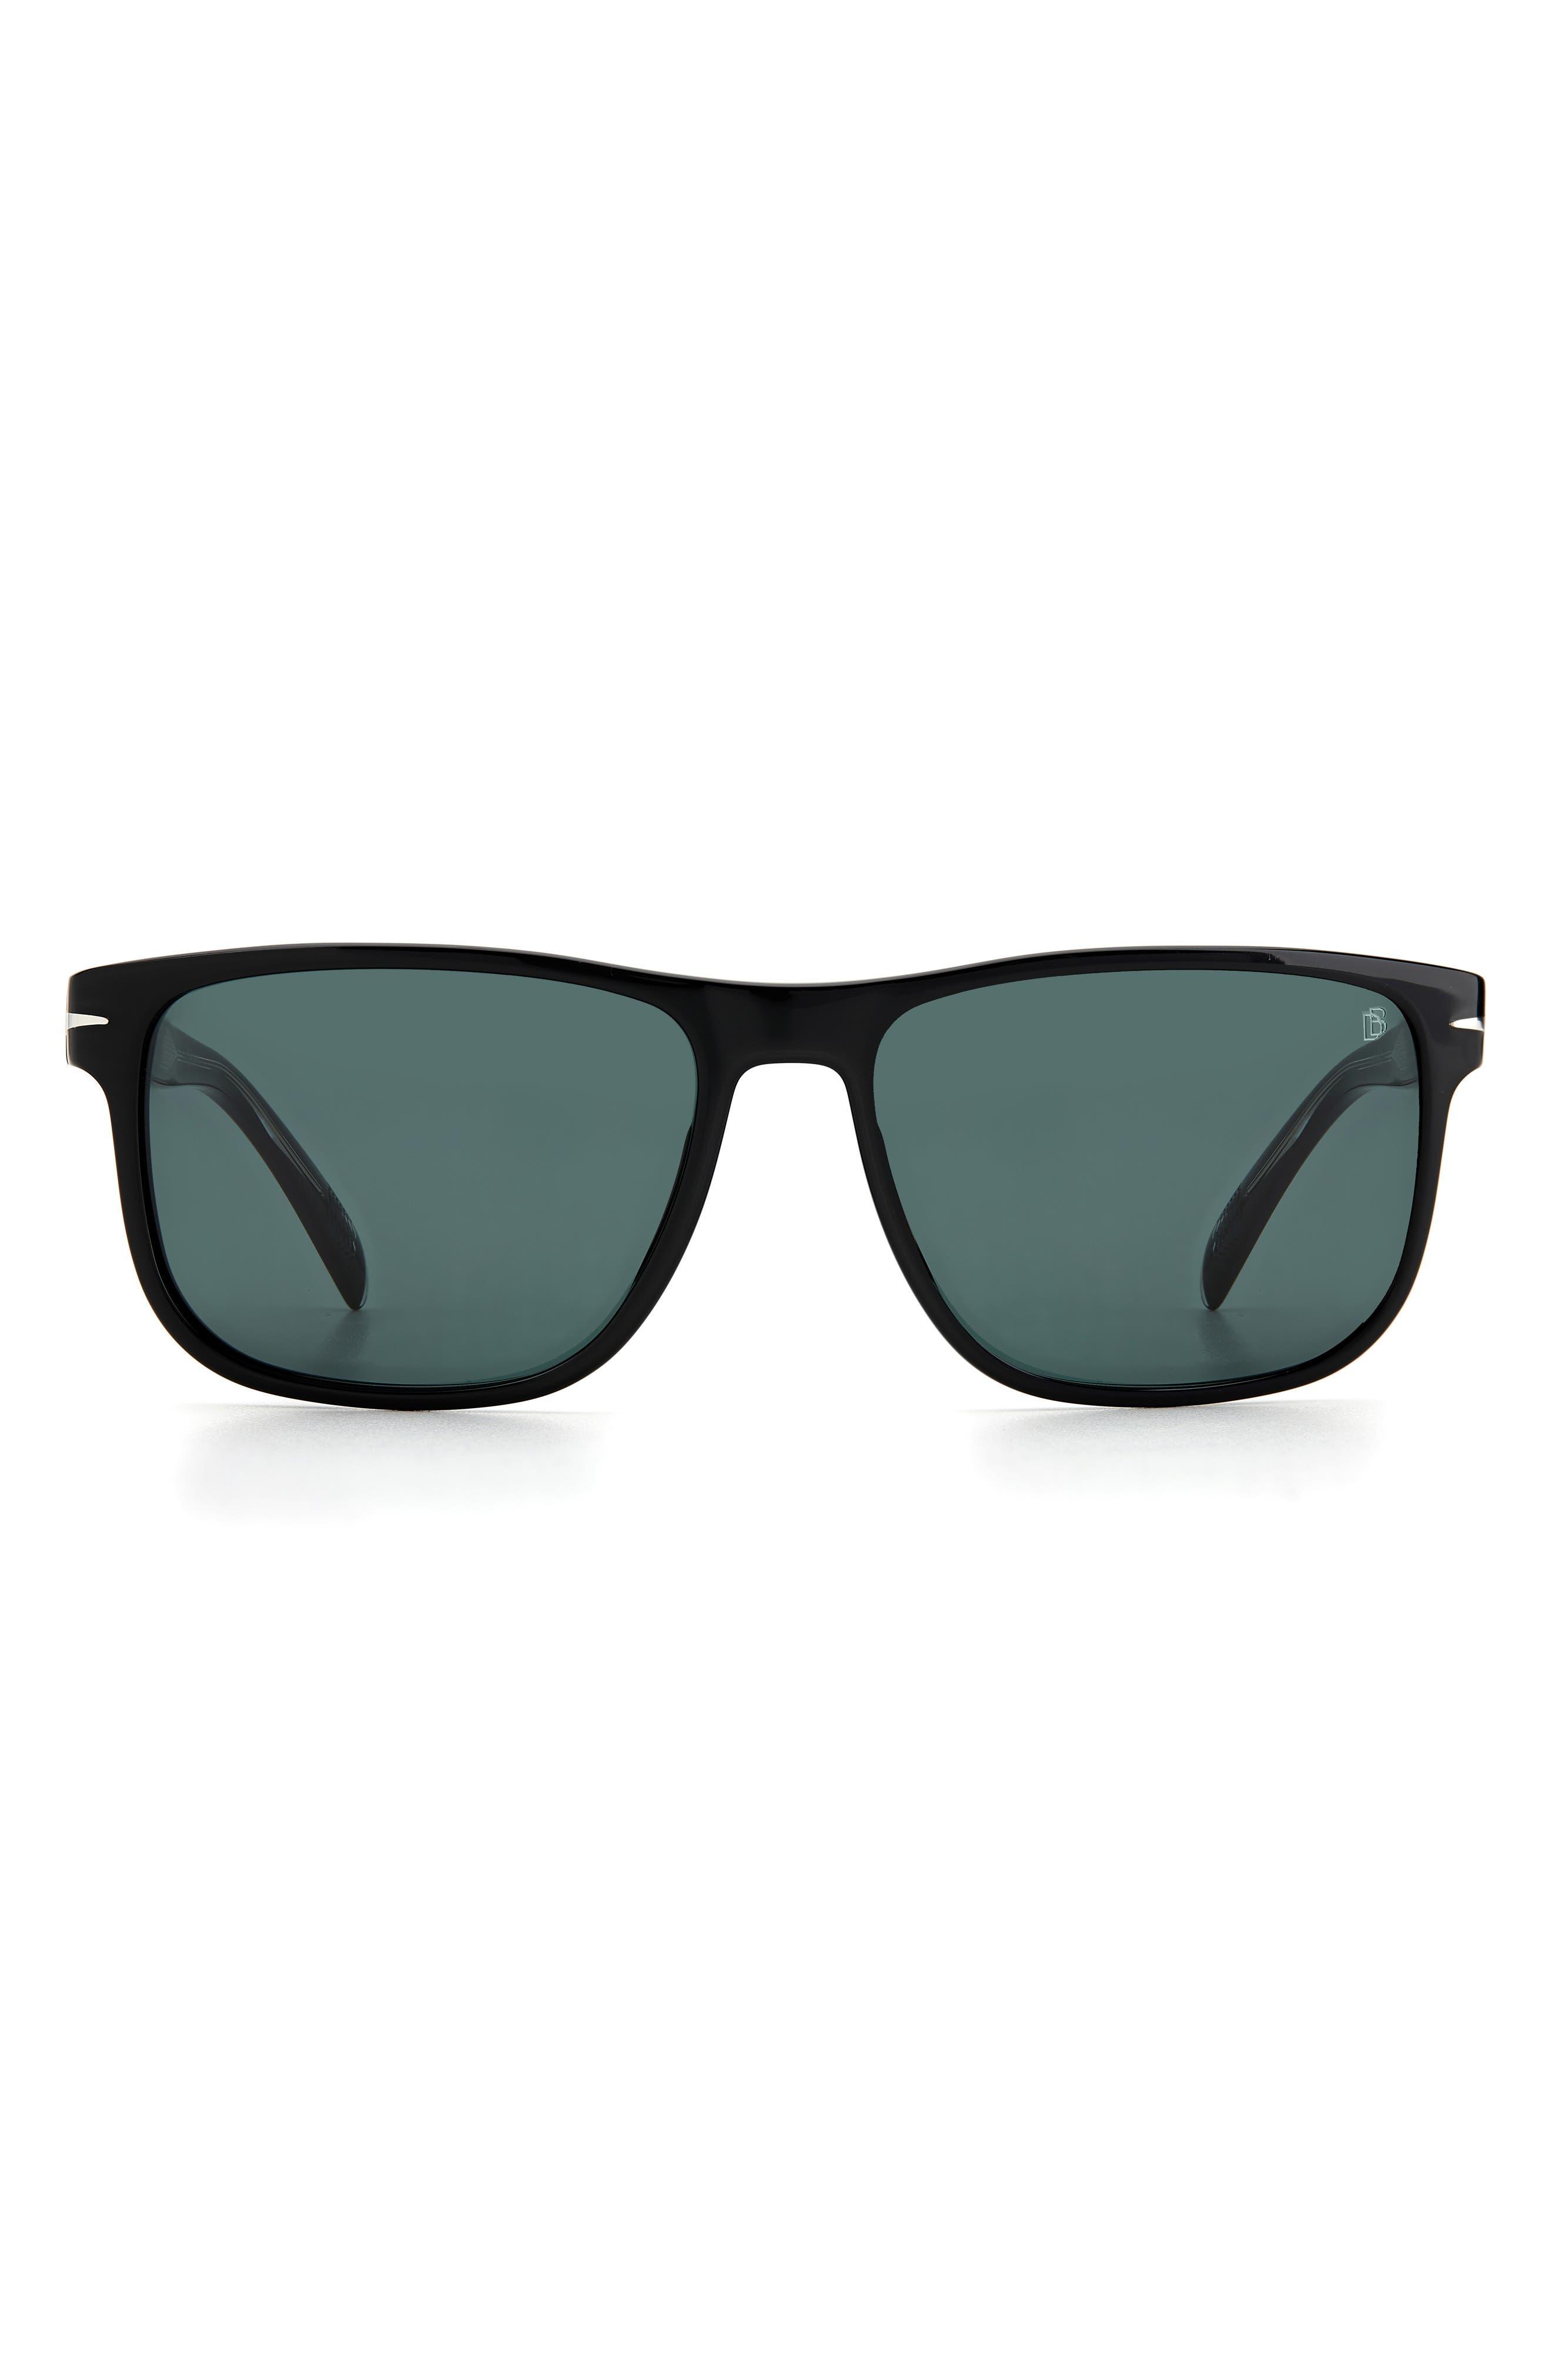 Men's David Beckham 57mm International Fit Square Sunglasses